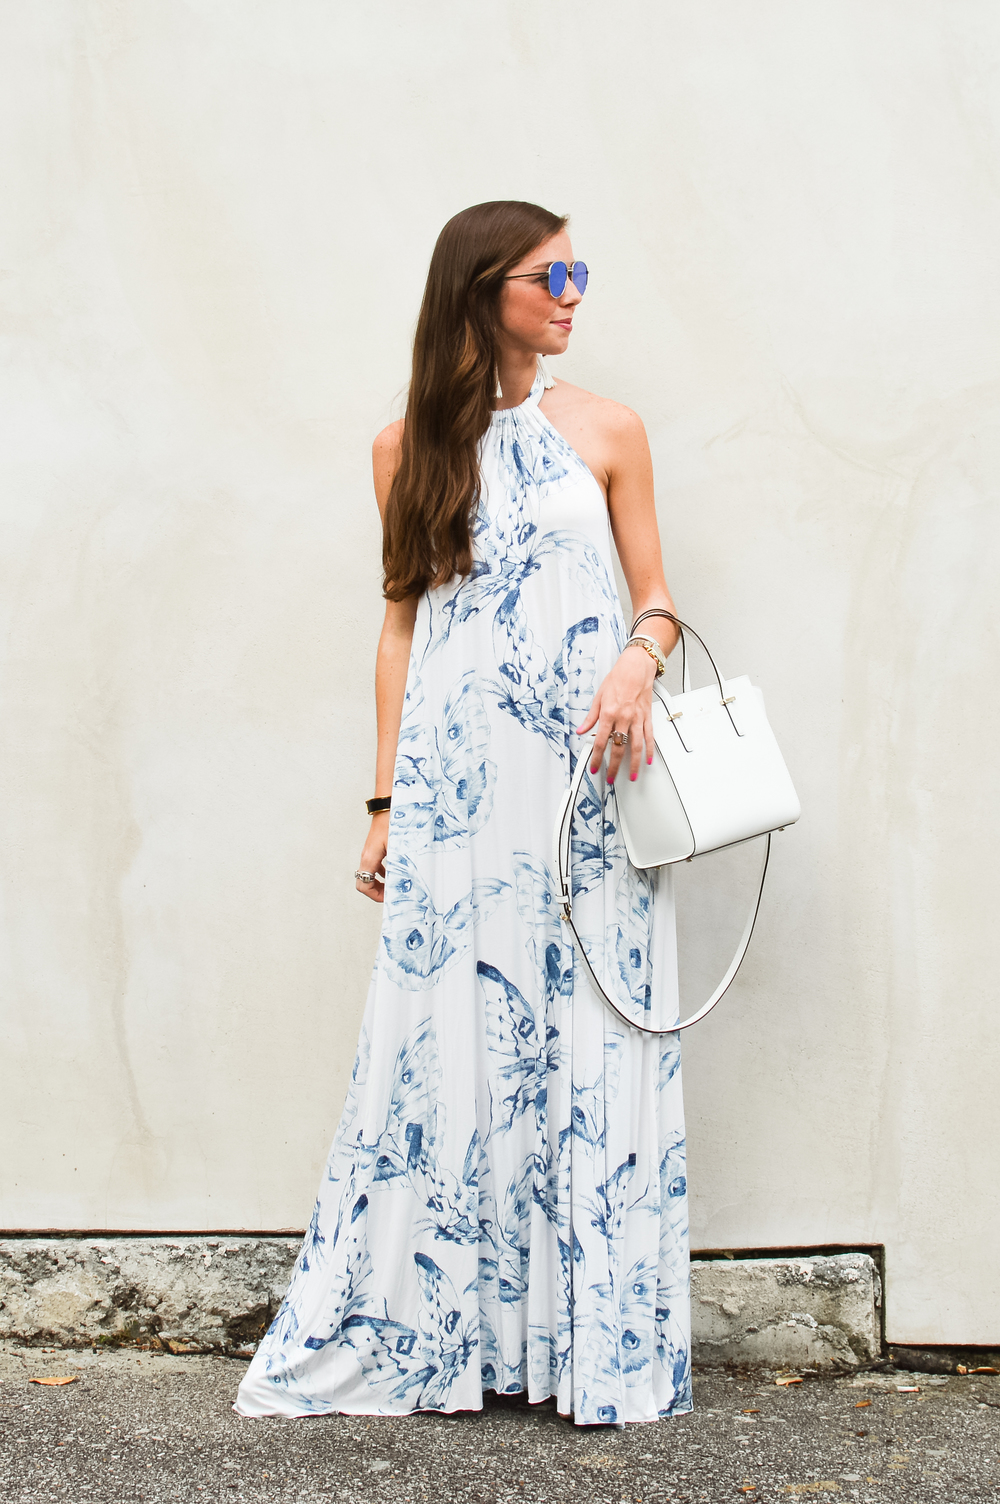 lcb_style_fashion_blogger_rachel pally maxi dress (17 of 31).jpg